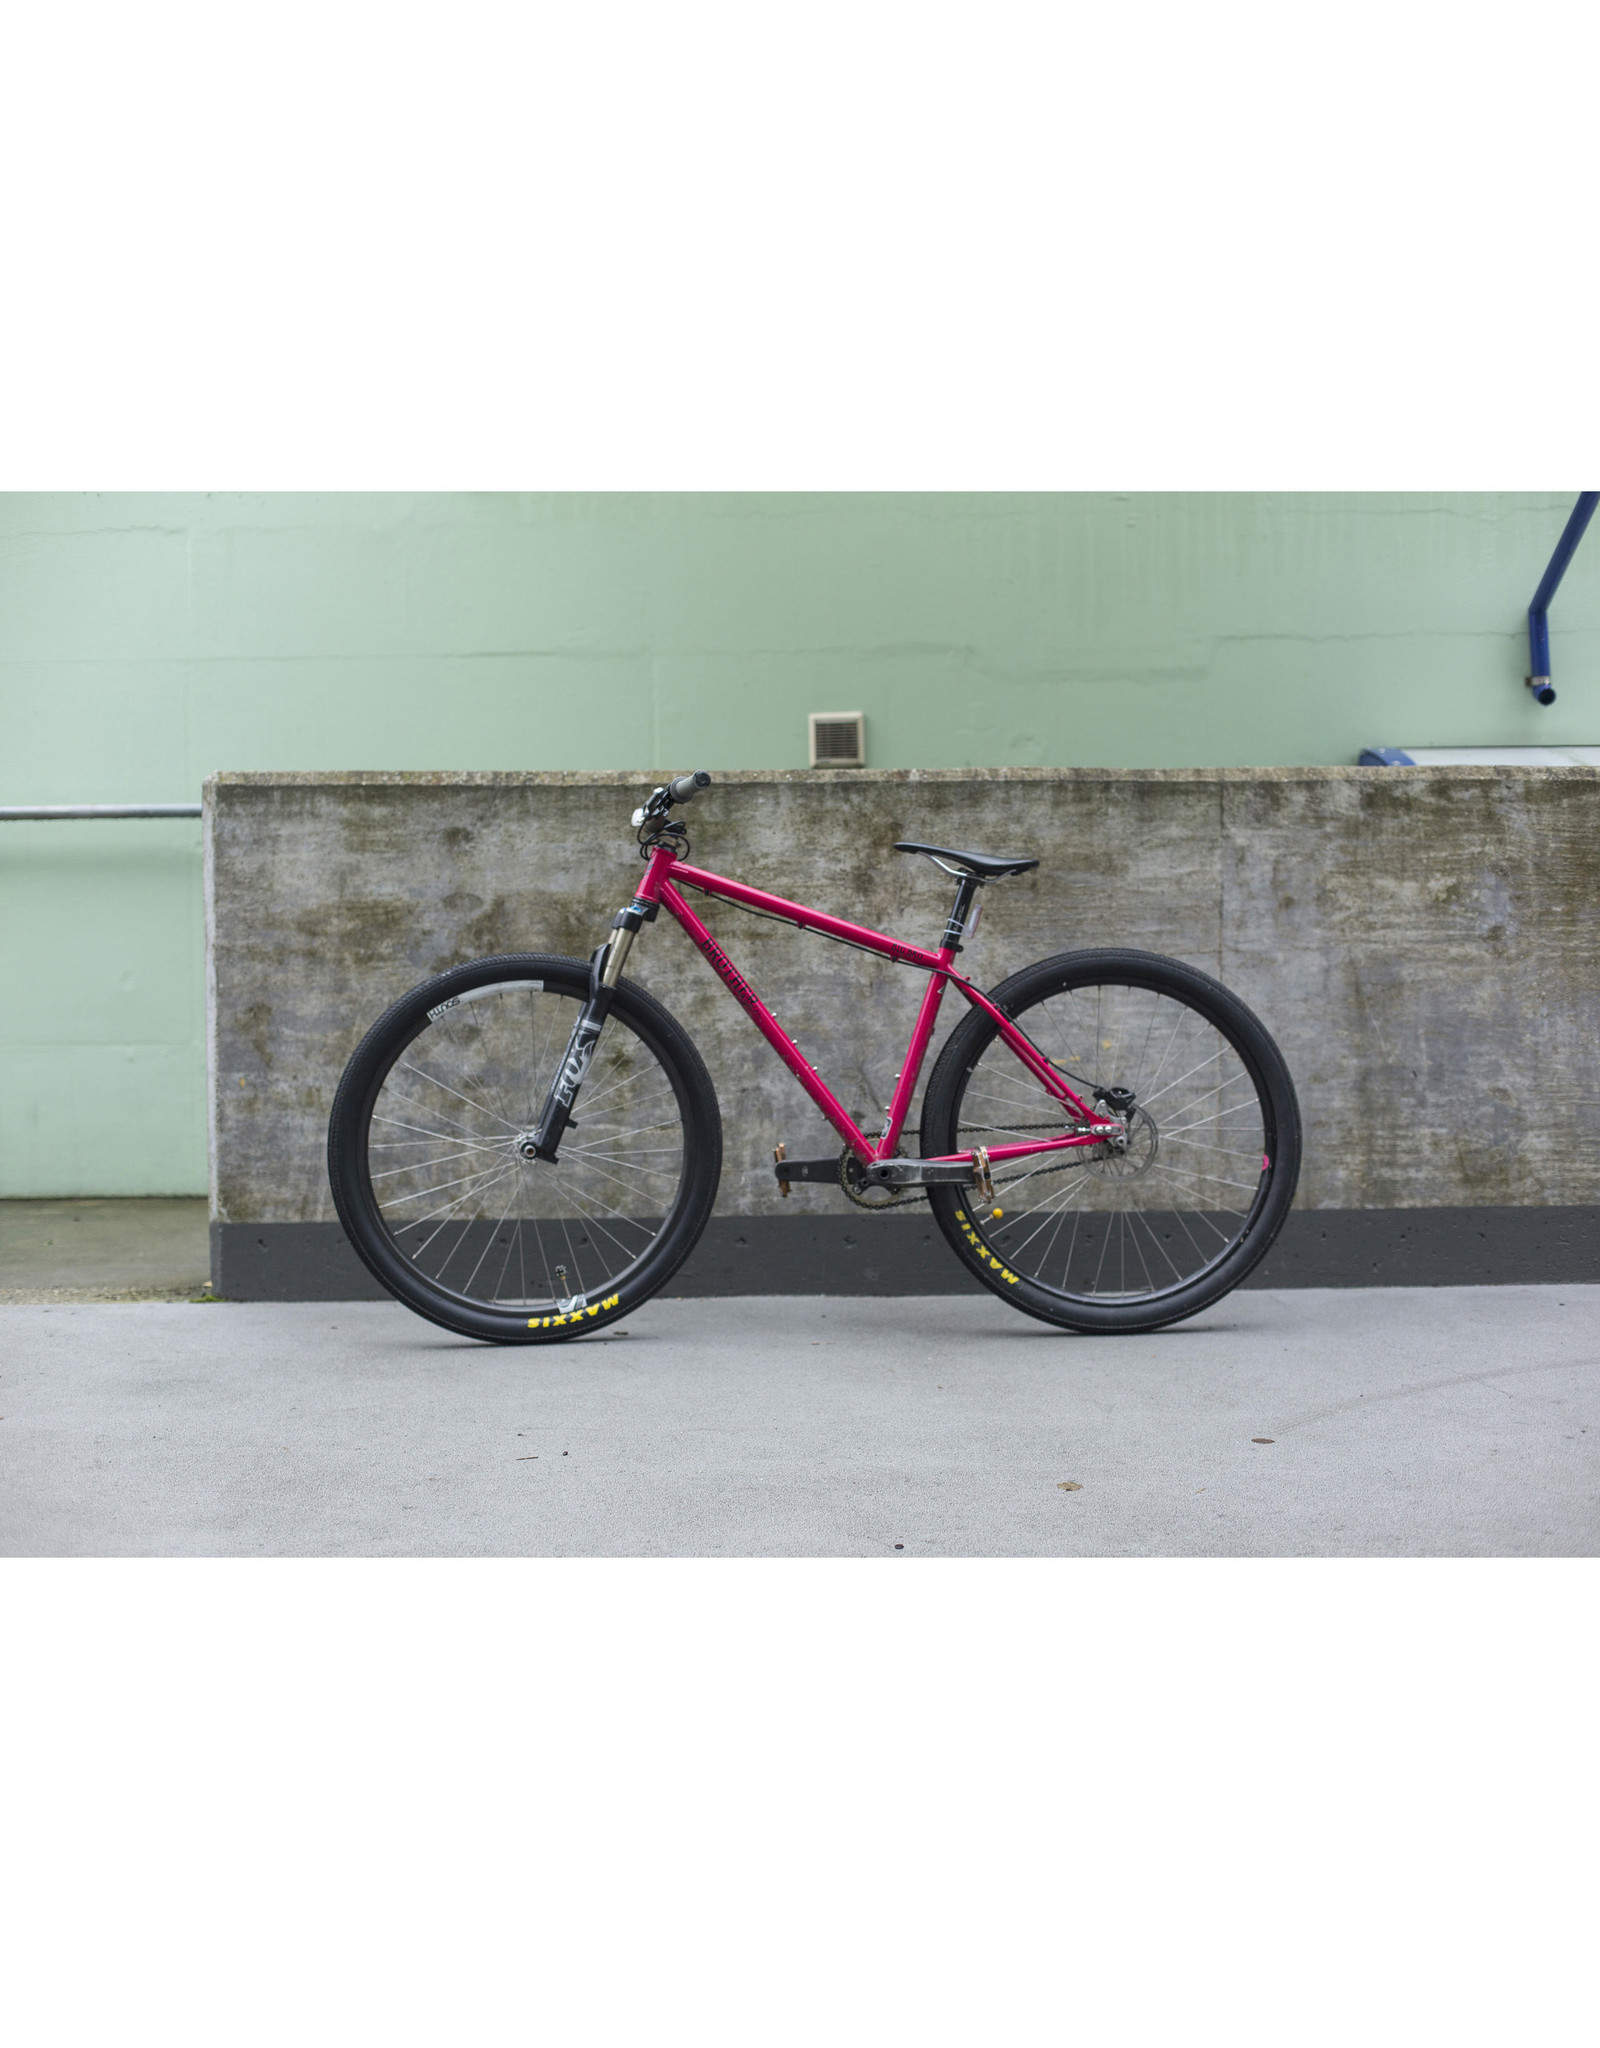 Seabass Cycles Brother Cycles - Big Bro - Custom Build